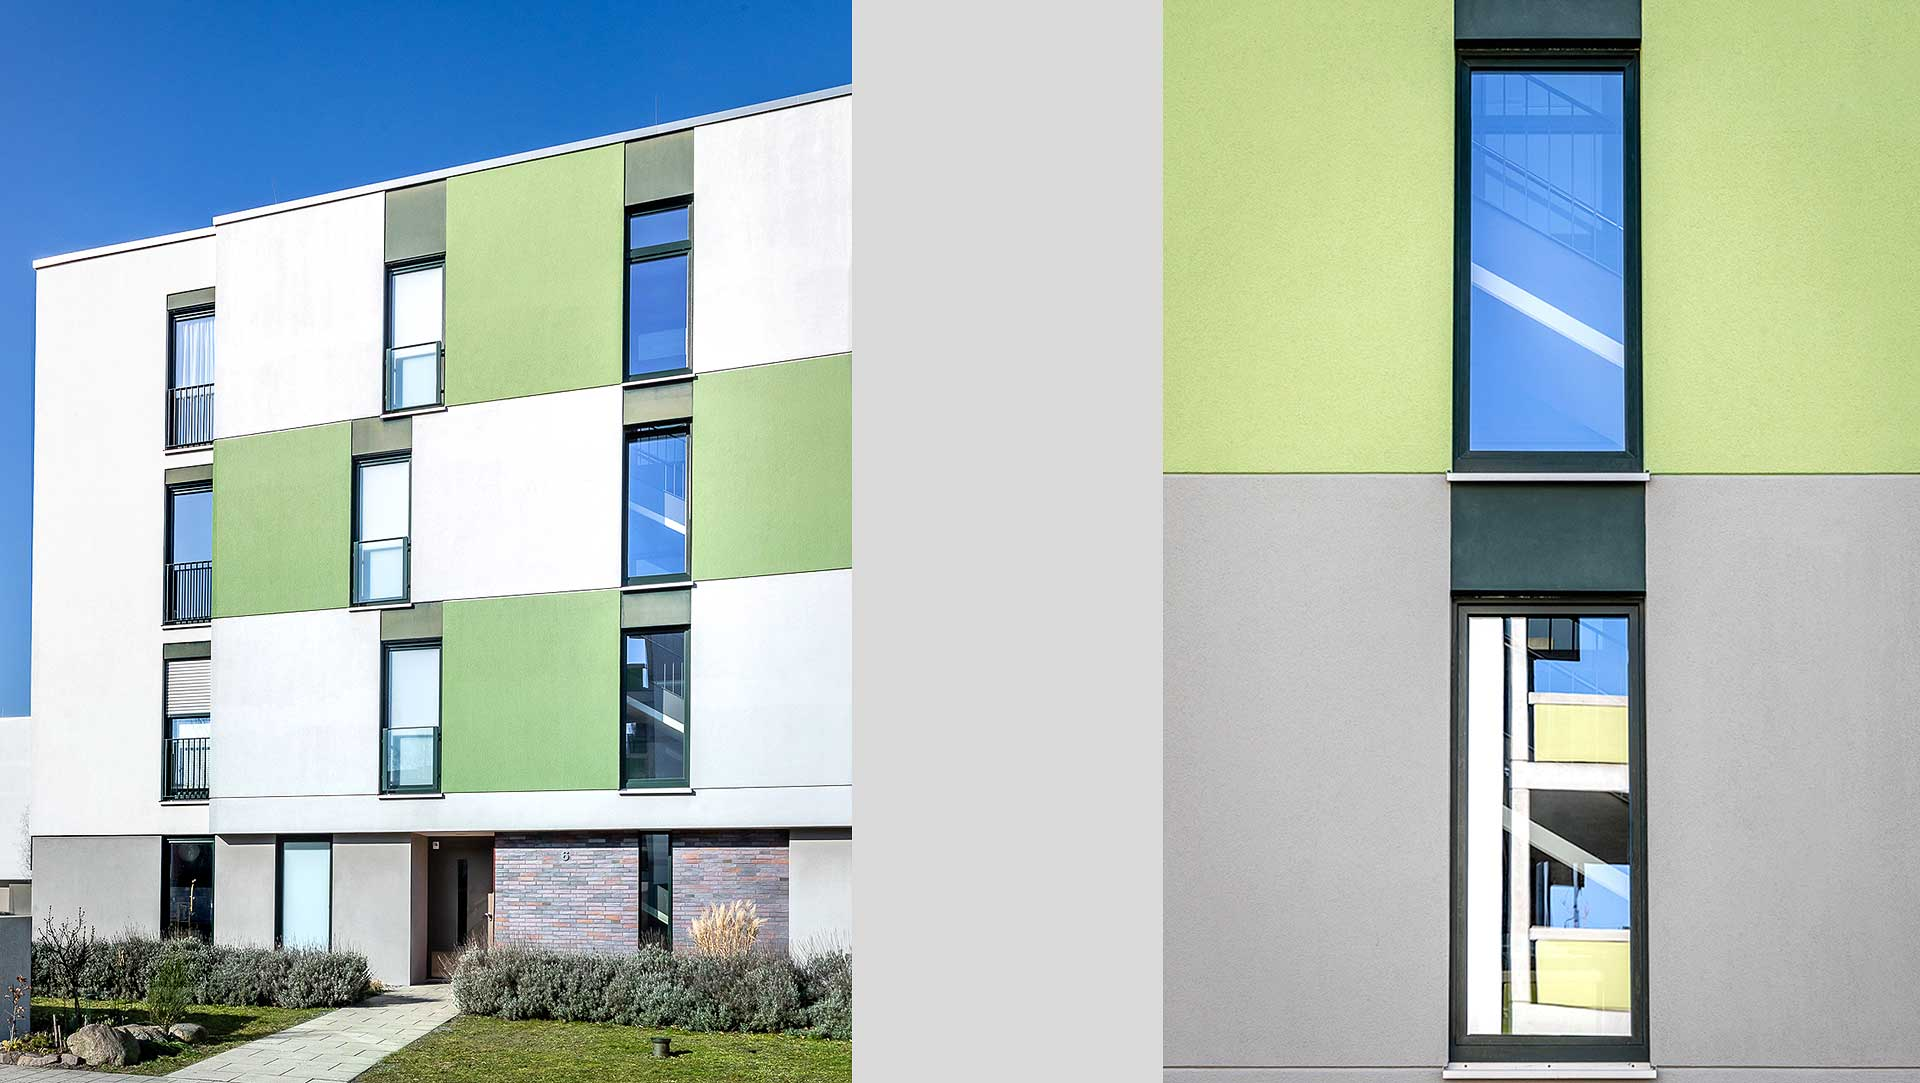 architekturfotograf-berlin-brandenburg--potsdam-gebaeudefotos-fassaden